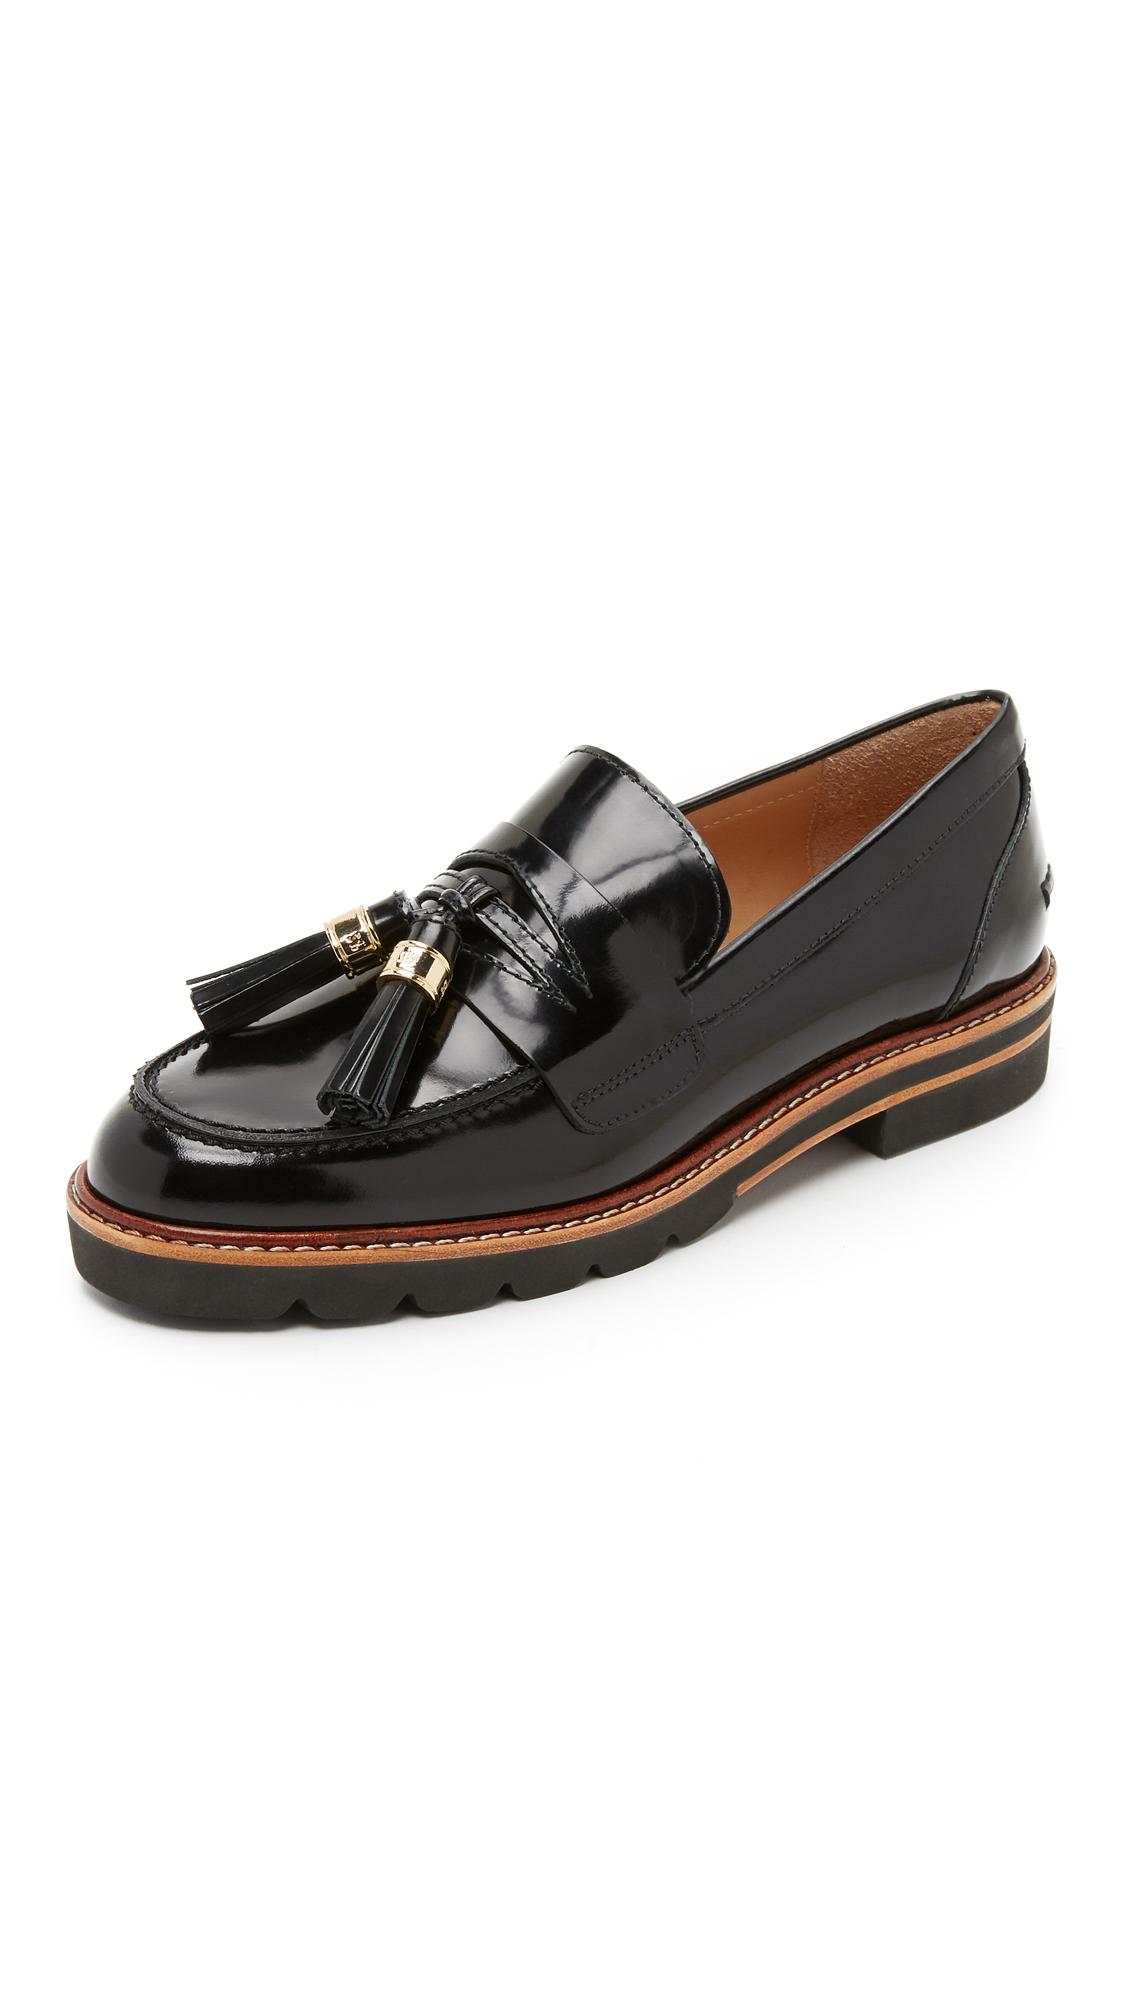 Stuart Weitzman Women's Node Loafer